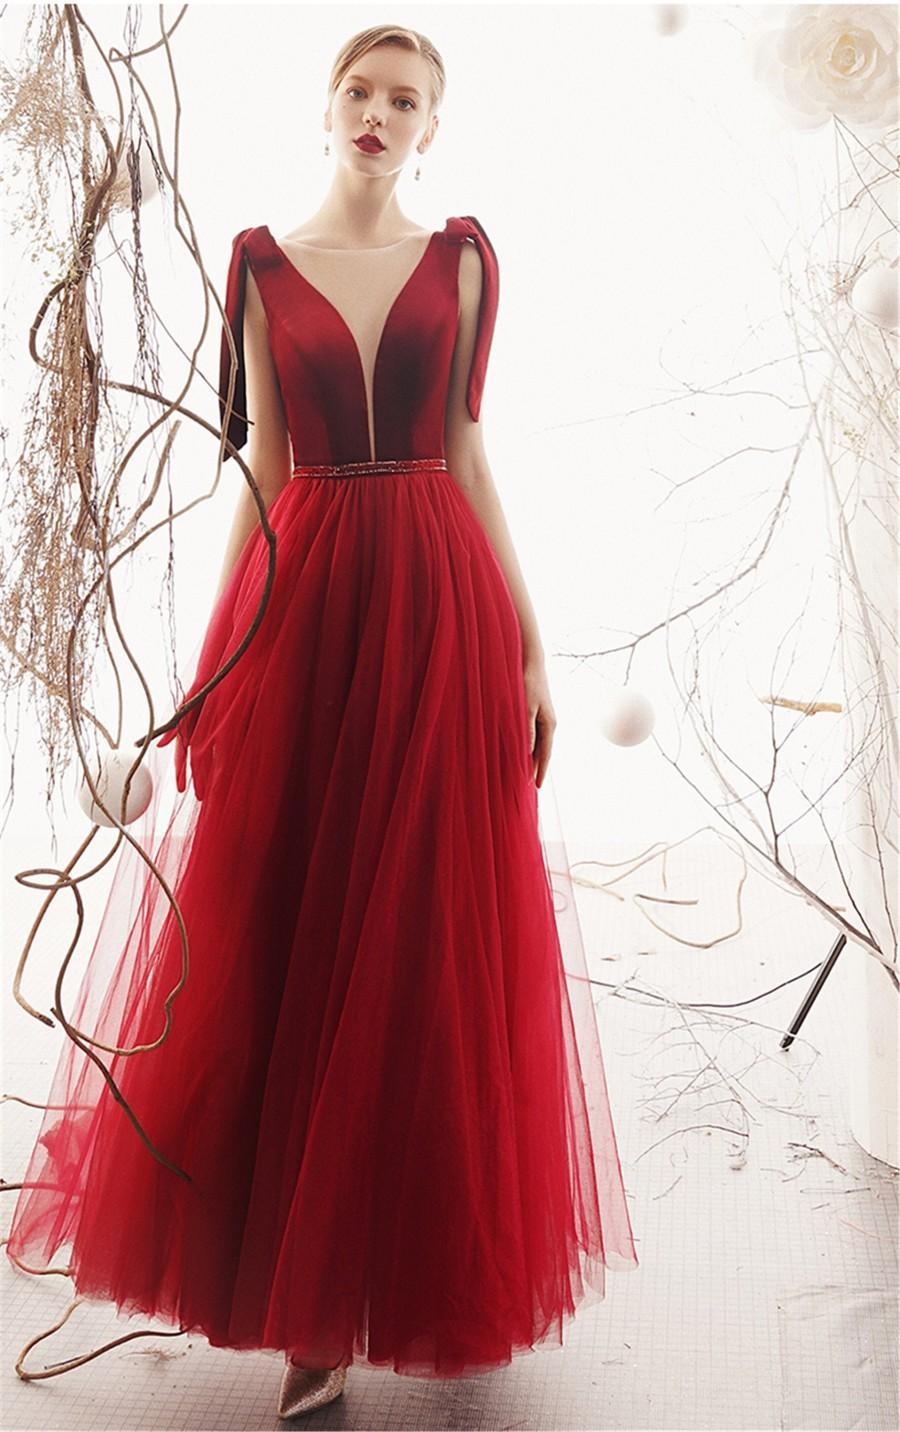 Wedding - Red Tulle Wedding Store Deep V-Neck Bridal Dress Lace Up Back Prom Dress A-Line Floor Length Formal Event Dress Dark Red Party Dress Long